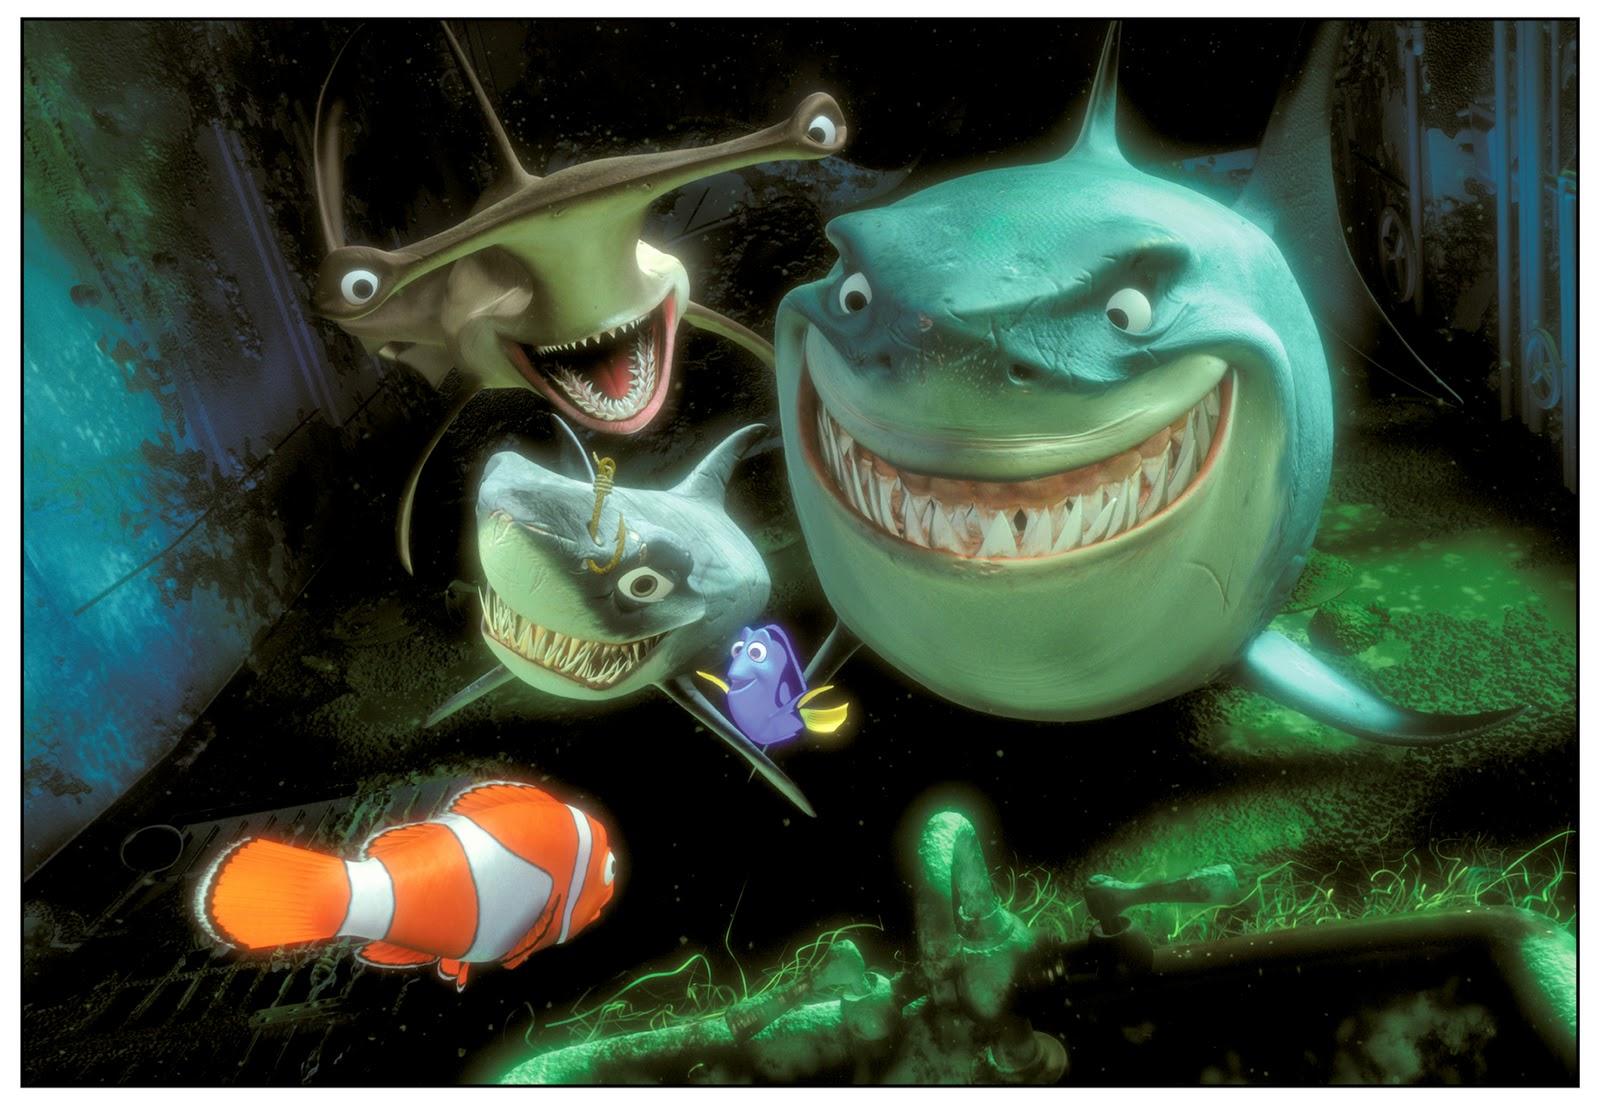 Film Guru Lad - Film Reviews: Finding Nemo 3D Review  Walt Disney Pictures Presents A Pixar Animation Studios Film Finding Nemo